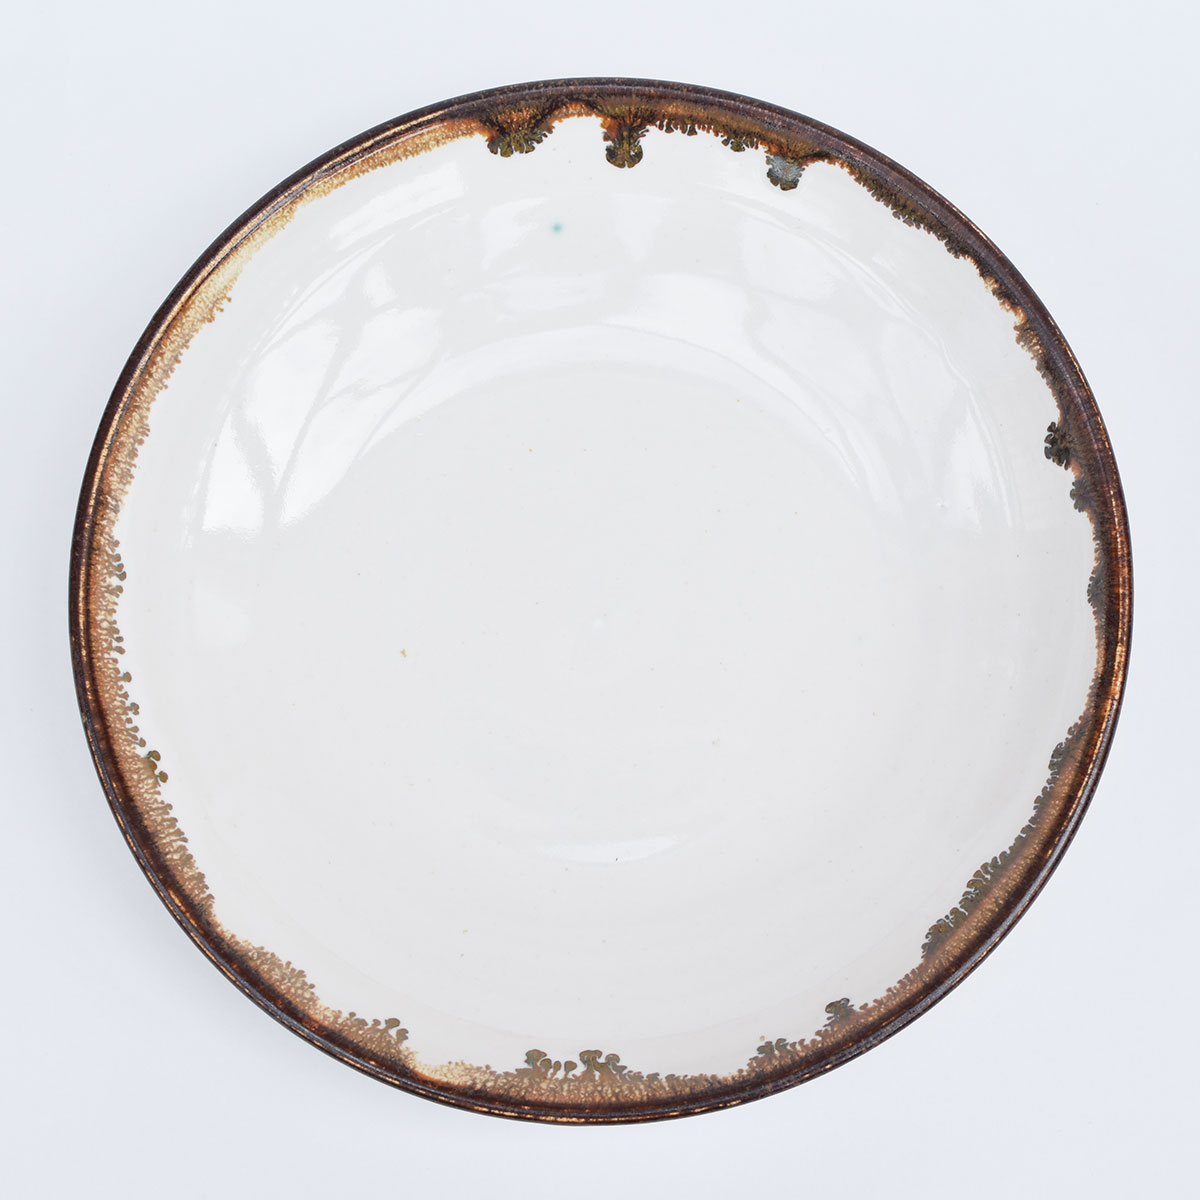 "картинка Керамическая тарелка из серии ""Маршмеллоу"" 22 см - DishWishes.Ru"